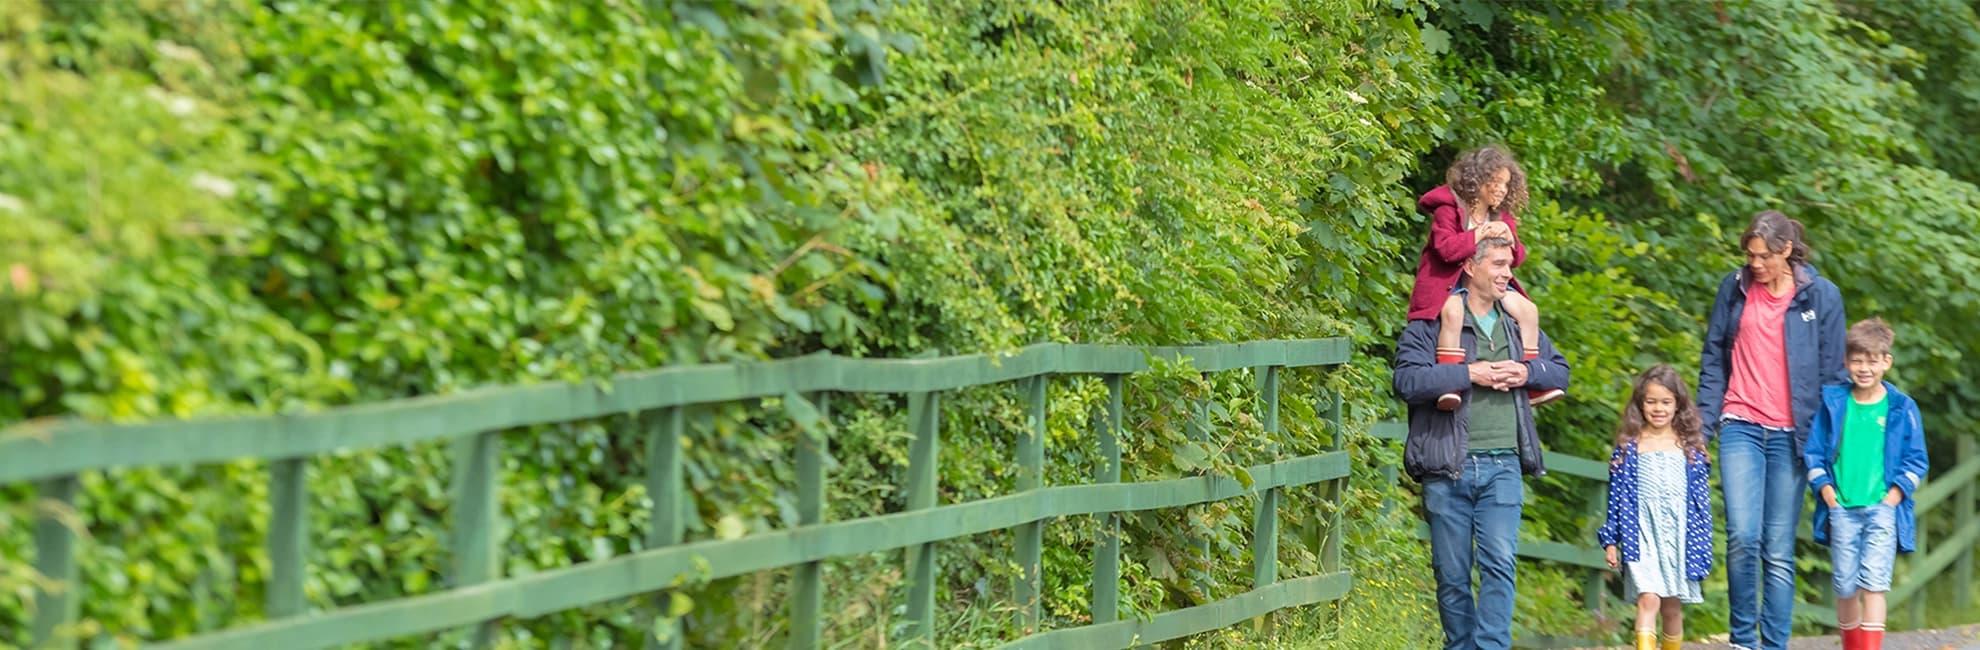 Torquay Holiday Park, Devon | Parkdean Resorts